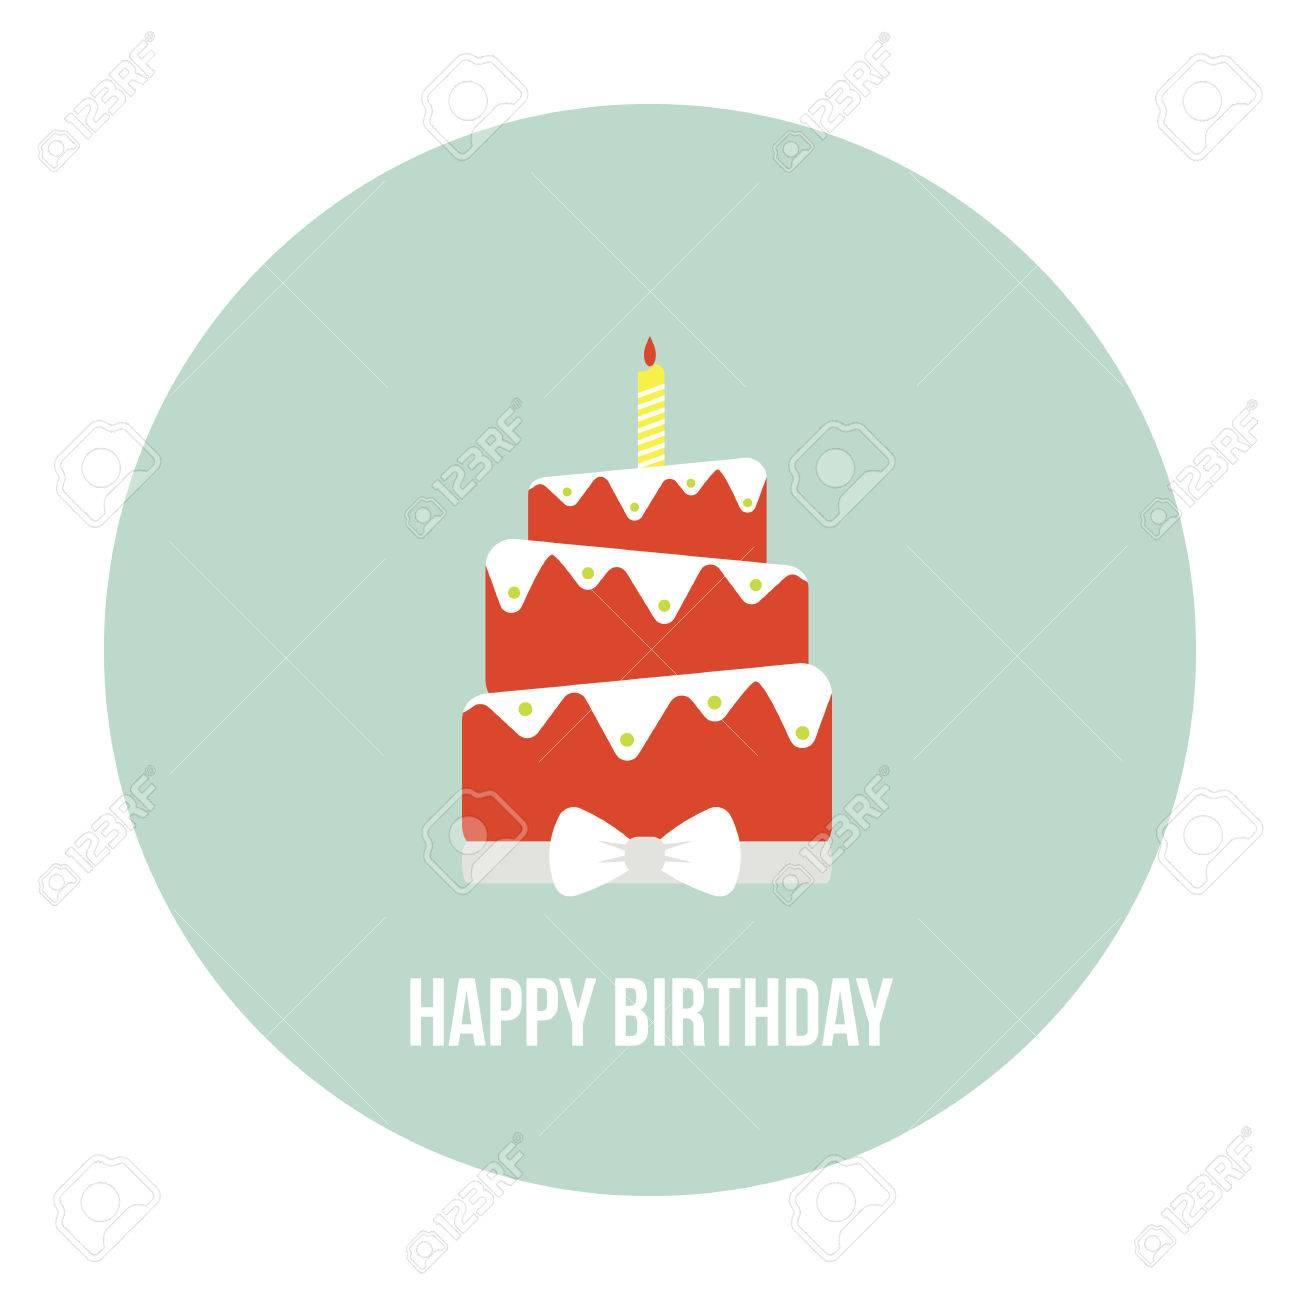 Astonishing Birthday Cake Illustration With Type On A Circle Background Funny Birthday Cards Online Amentibdeldamsfinfo